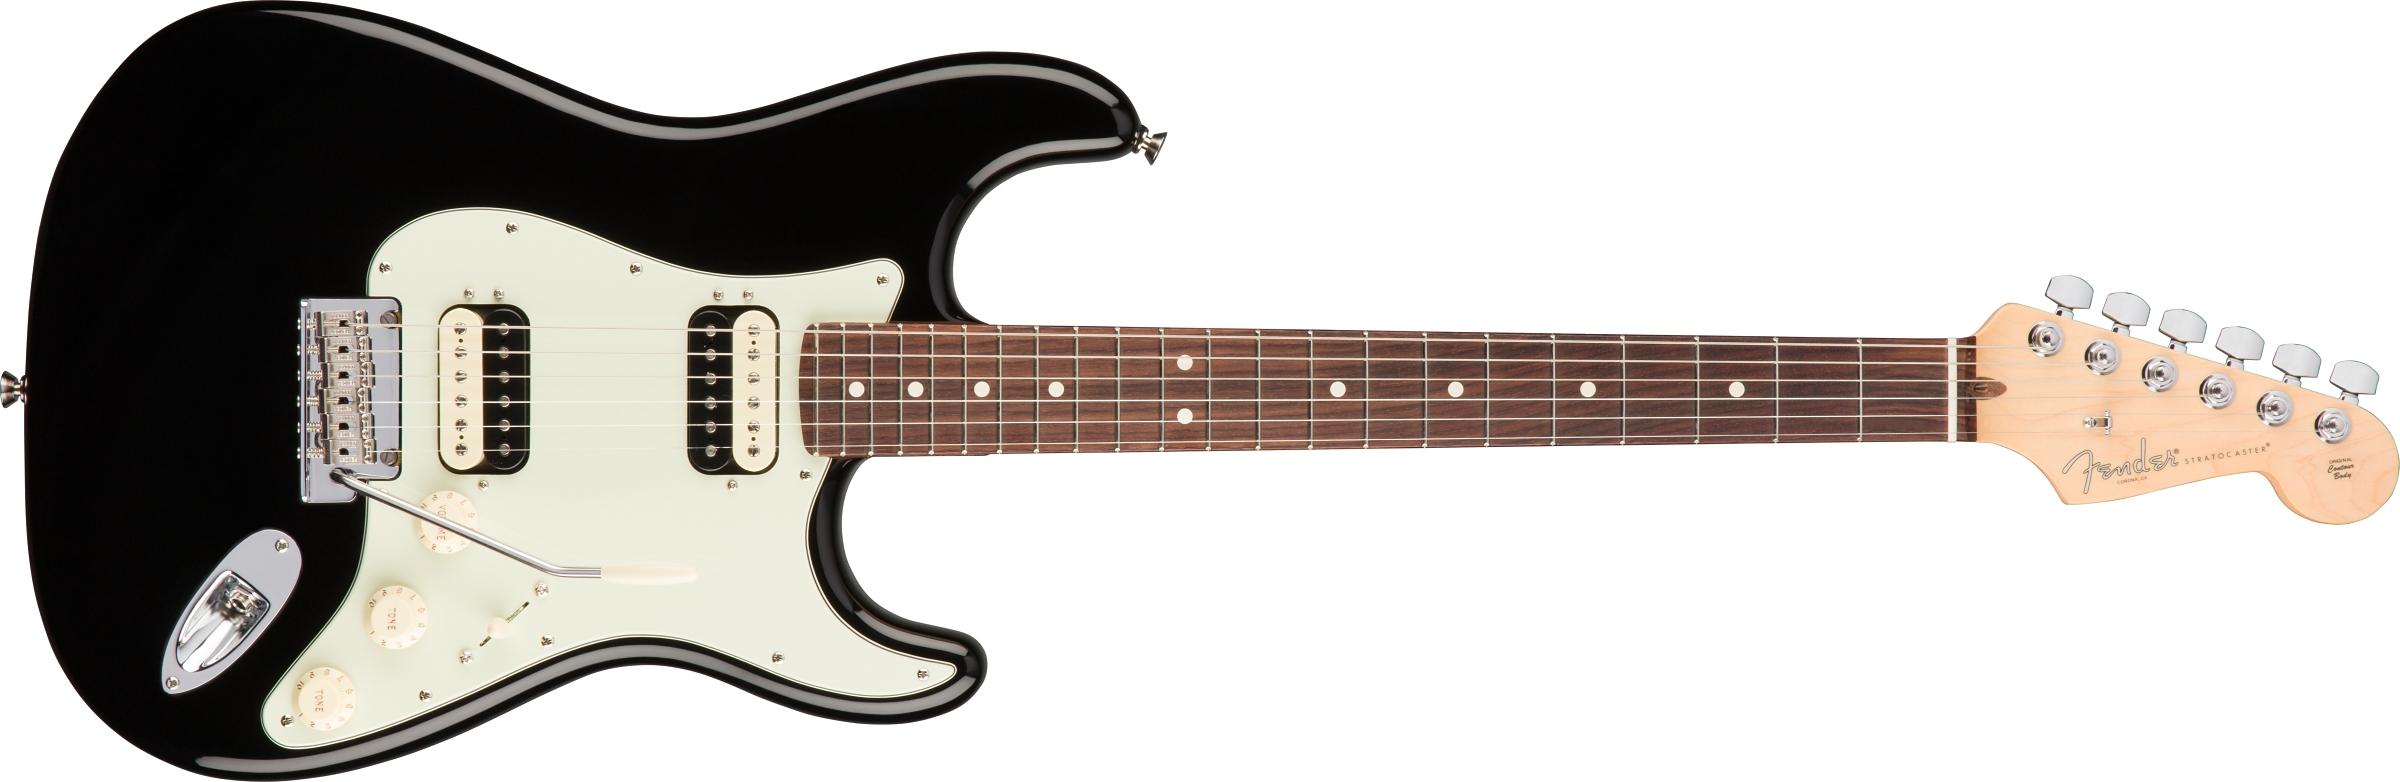 american professional stratocaster hh shawbucker electric guitars. Black Bedroom Furniture Sets. Home Design Ideas